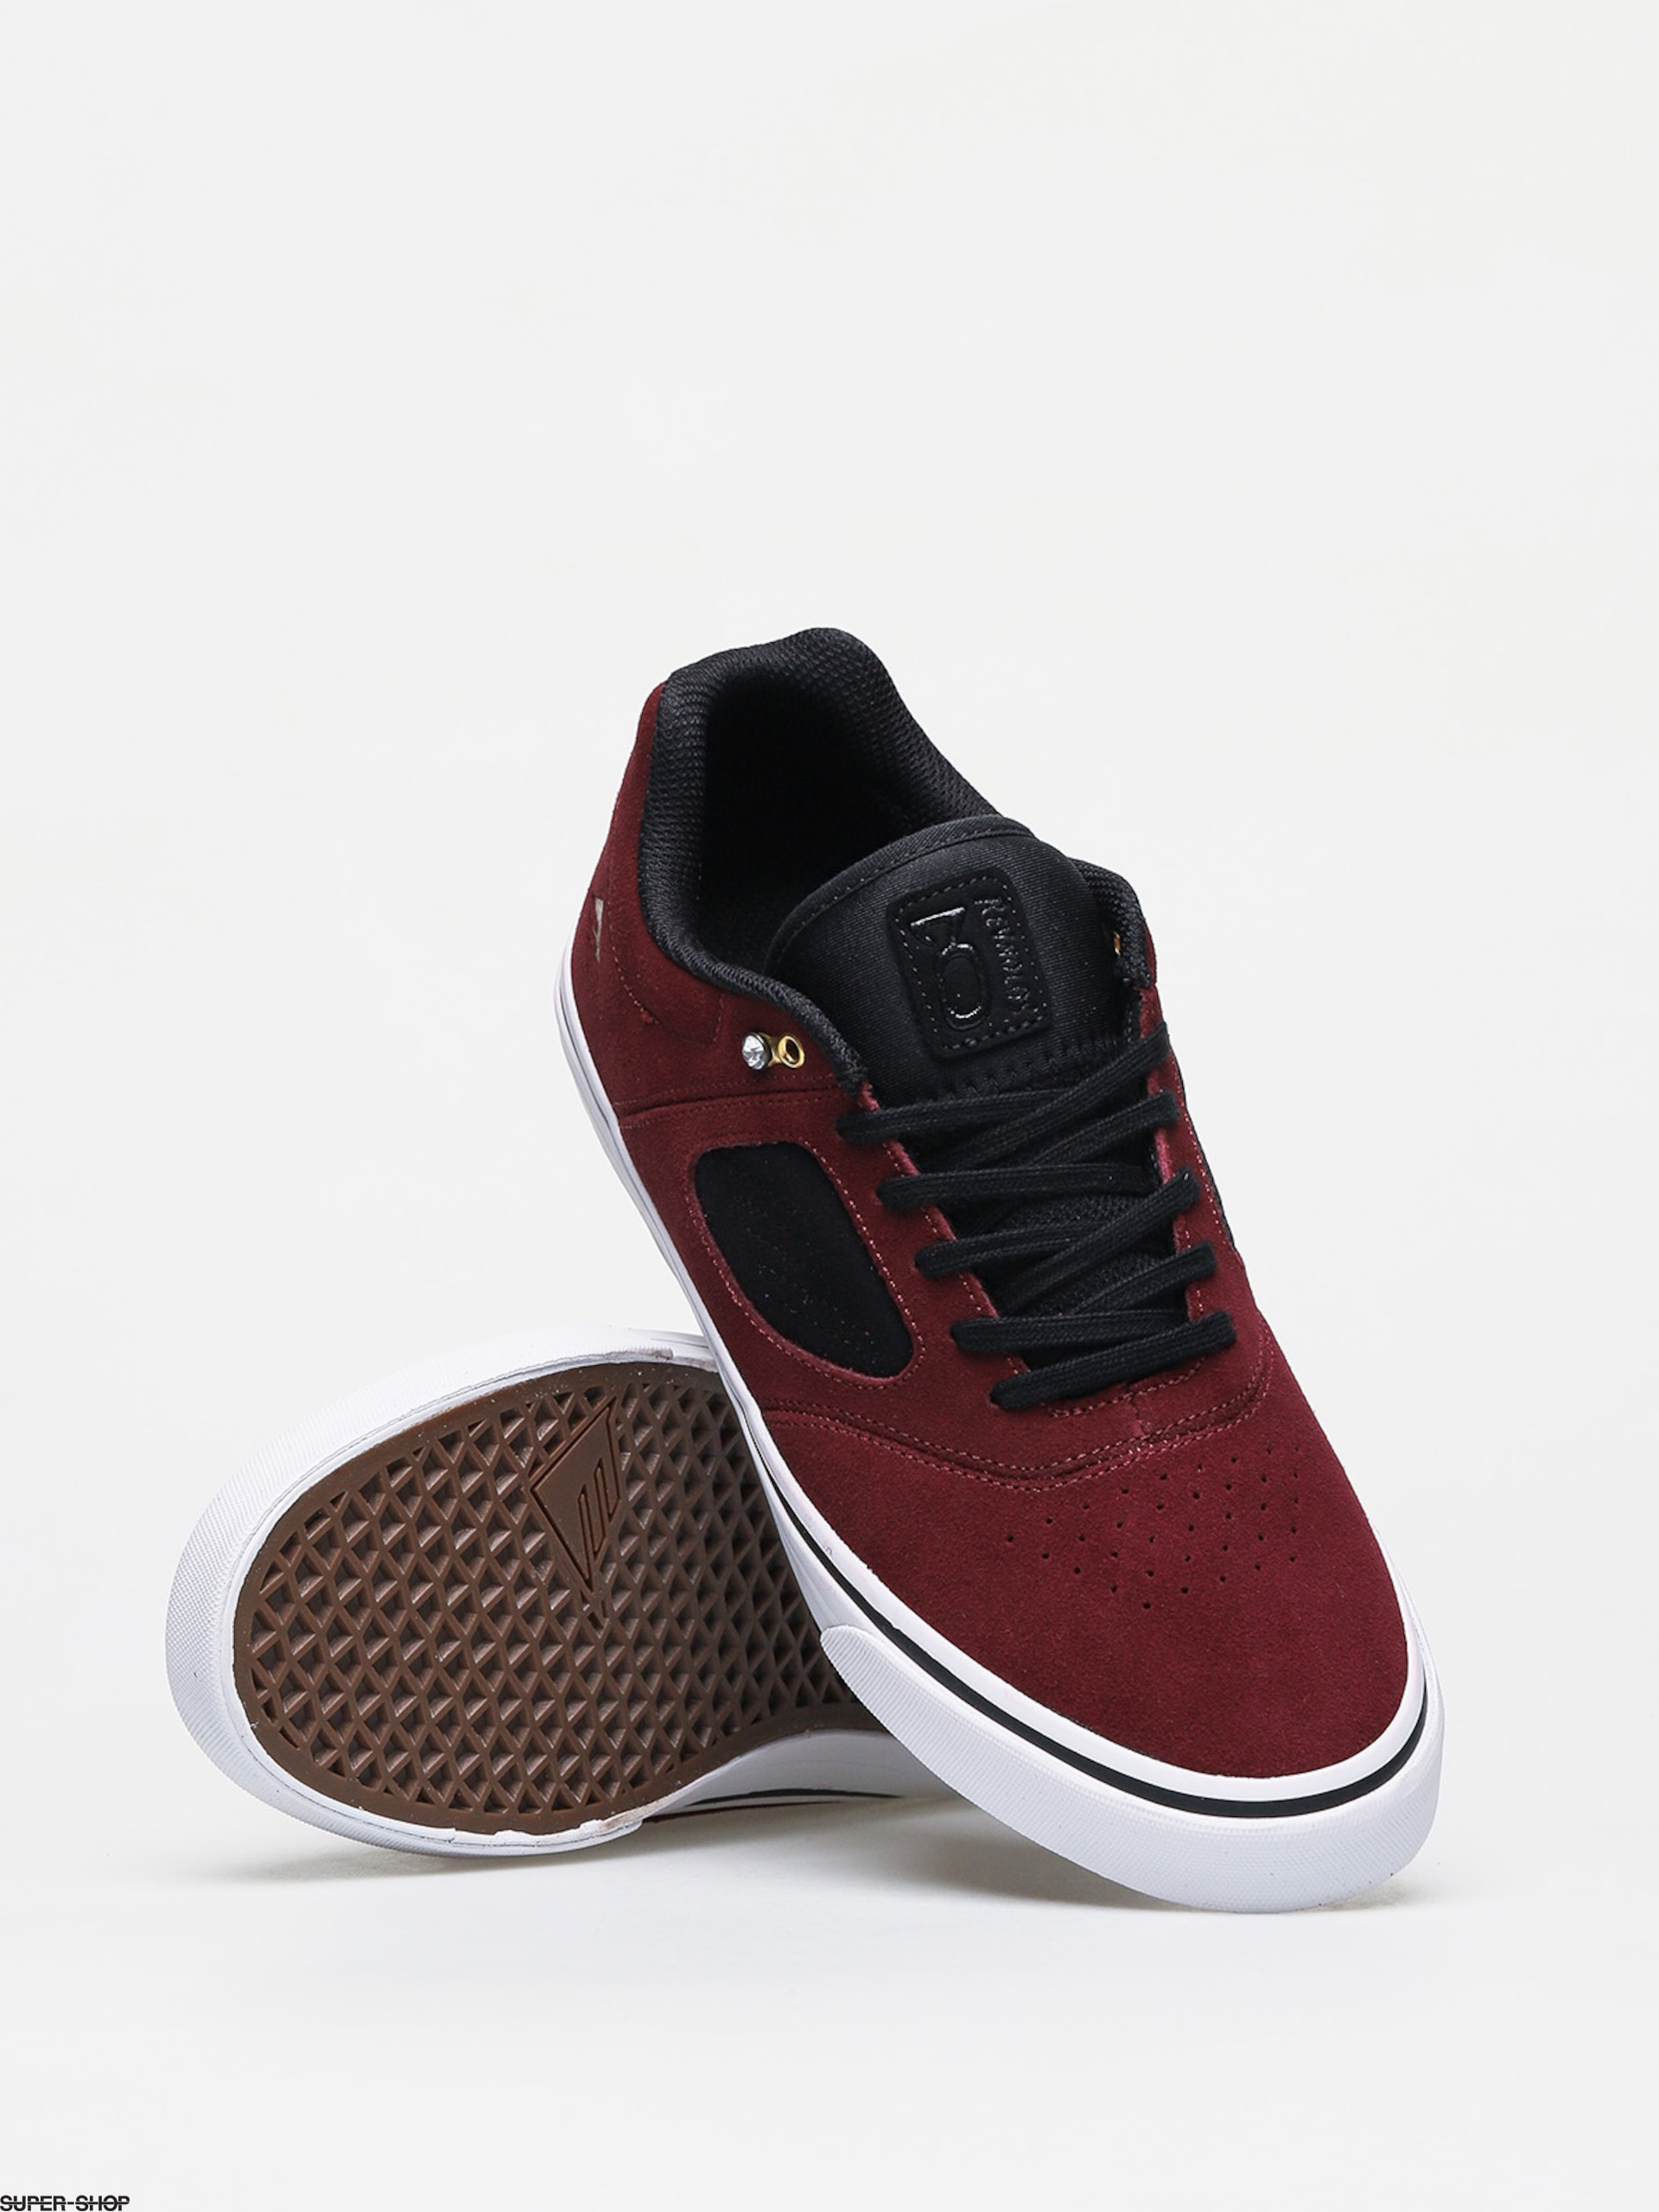 Emerica Reynolds 3 G6 Vulc Shoes